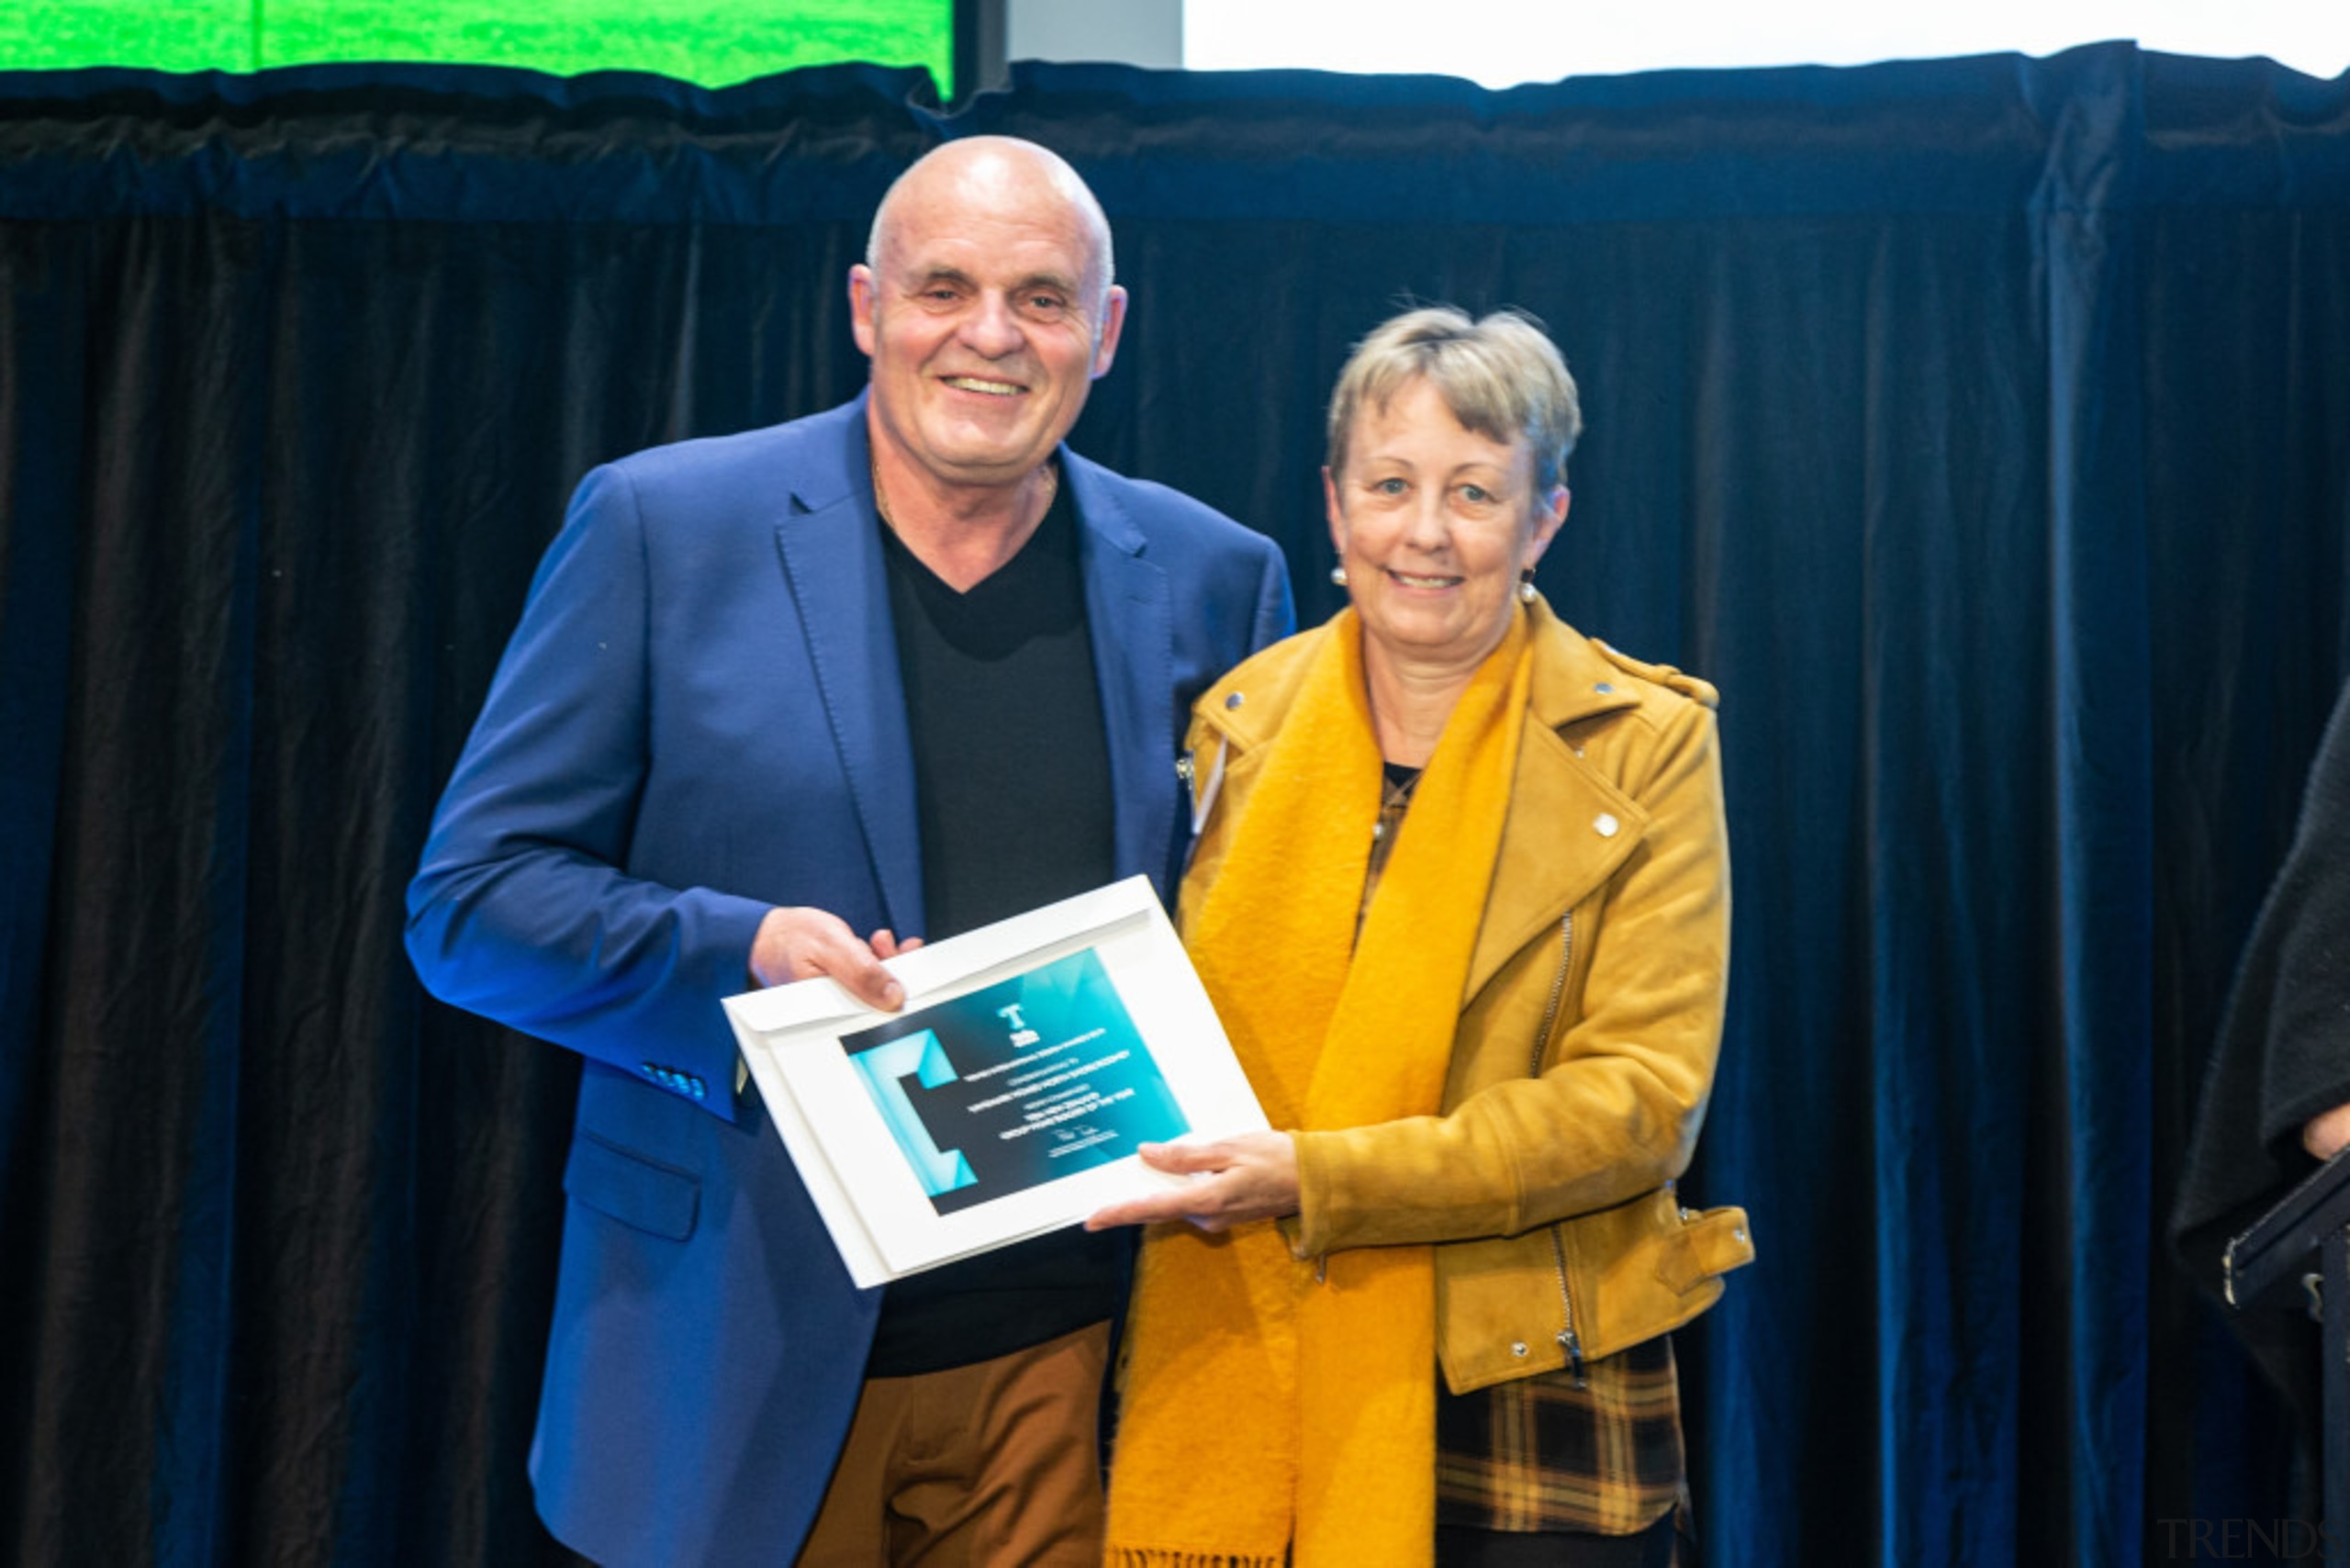 2019 TIDA New Zealand Homes presentation evening award, award ceremony, employment, event, job, blue